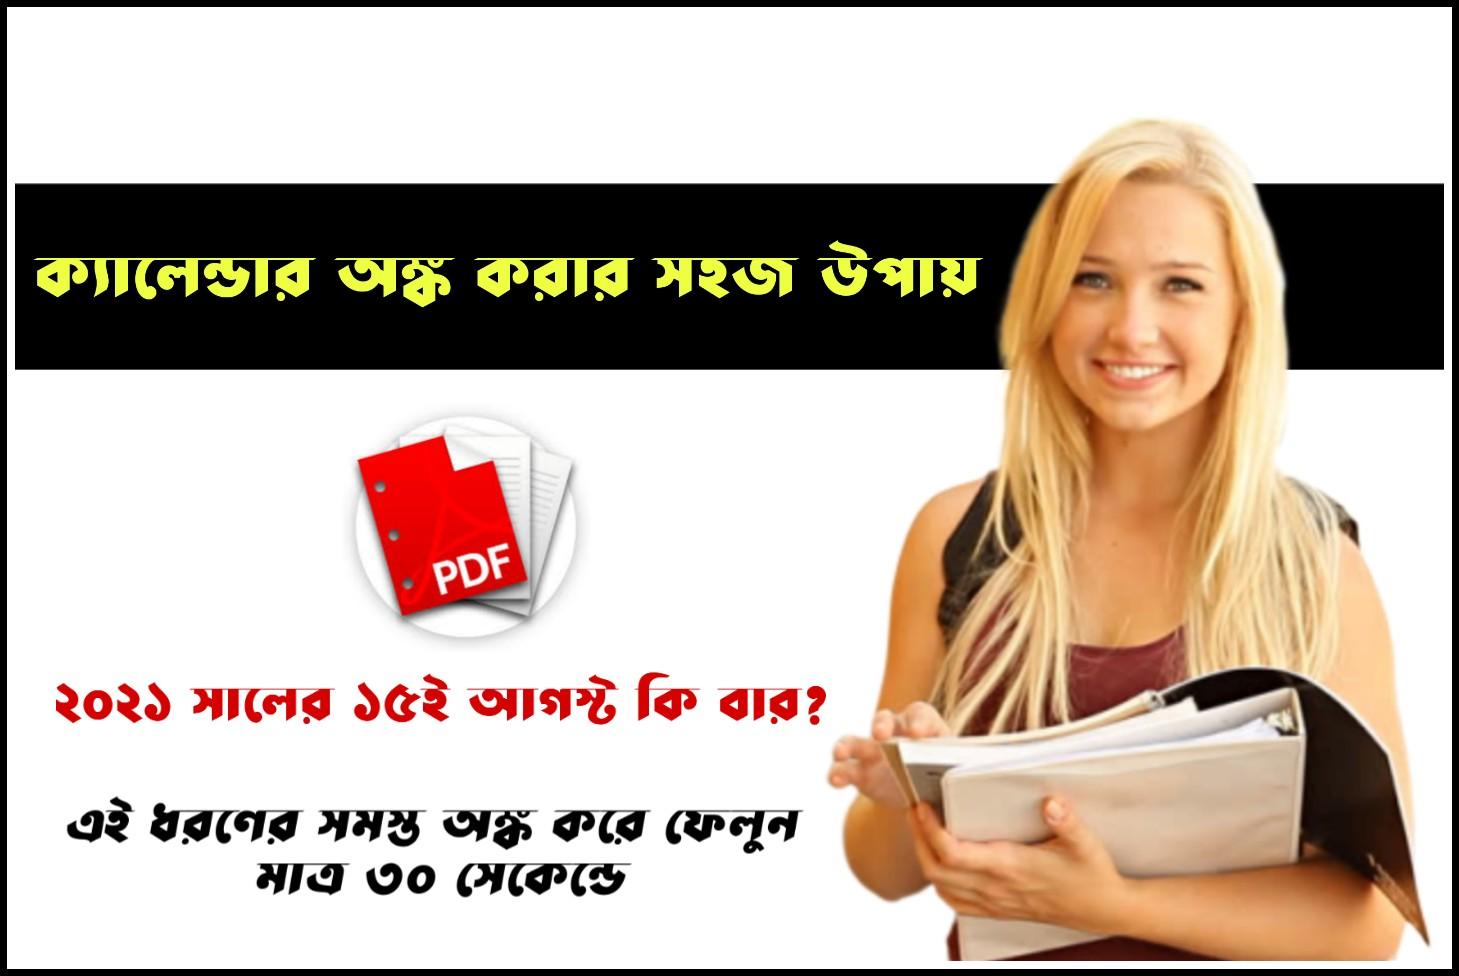 Calendar Math Shortcut Tricks in Bengali PDF || ক্যালেন্ডার অঙ্ক করার সহজ উপায় || Math Shortcut Tricks in Bengali